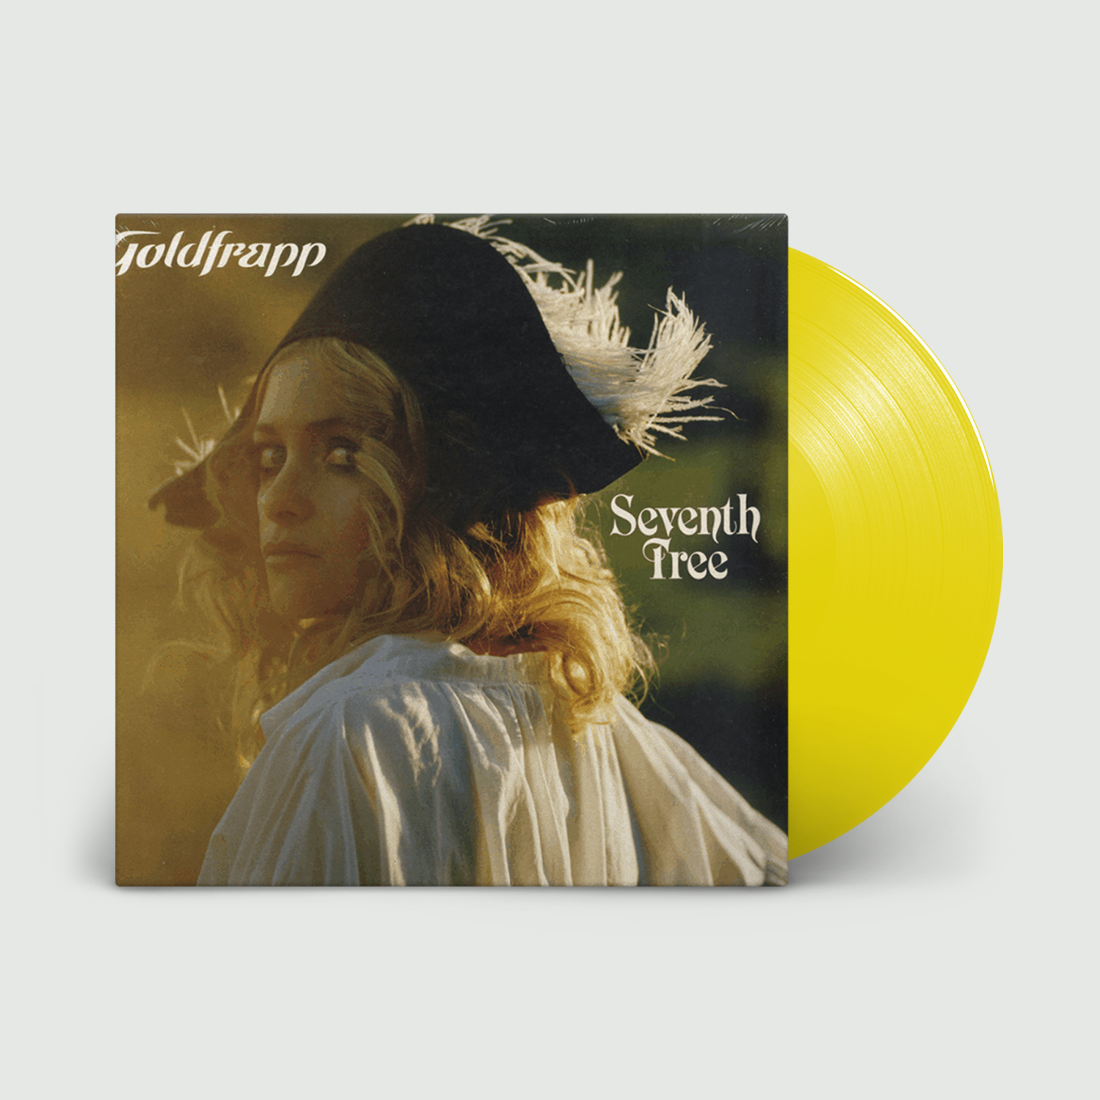 Seventh Tree - Goldfrapp - Musik - BMG Rights Management LLC - 4050538626582 - 5/3-2021